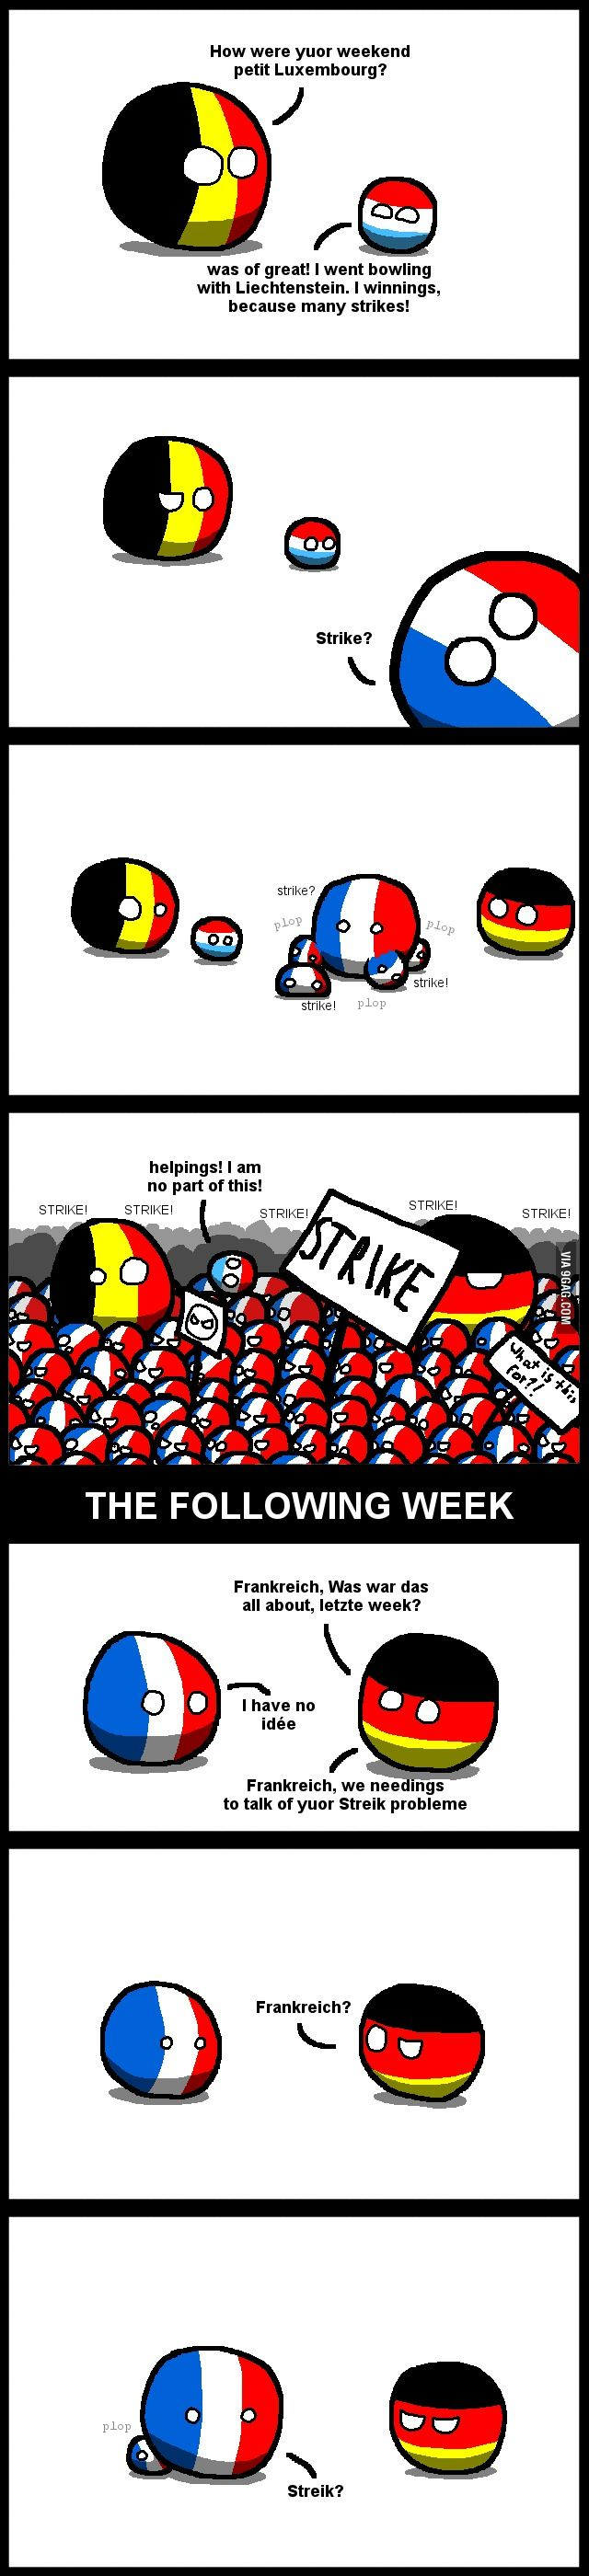 - Frankreich yuo have streik probleme ! - Streik ?